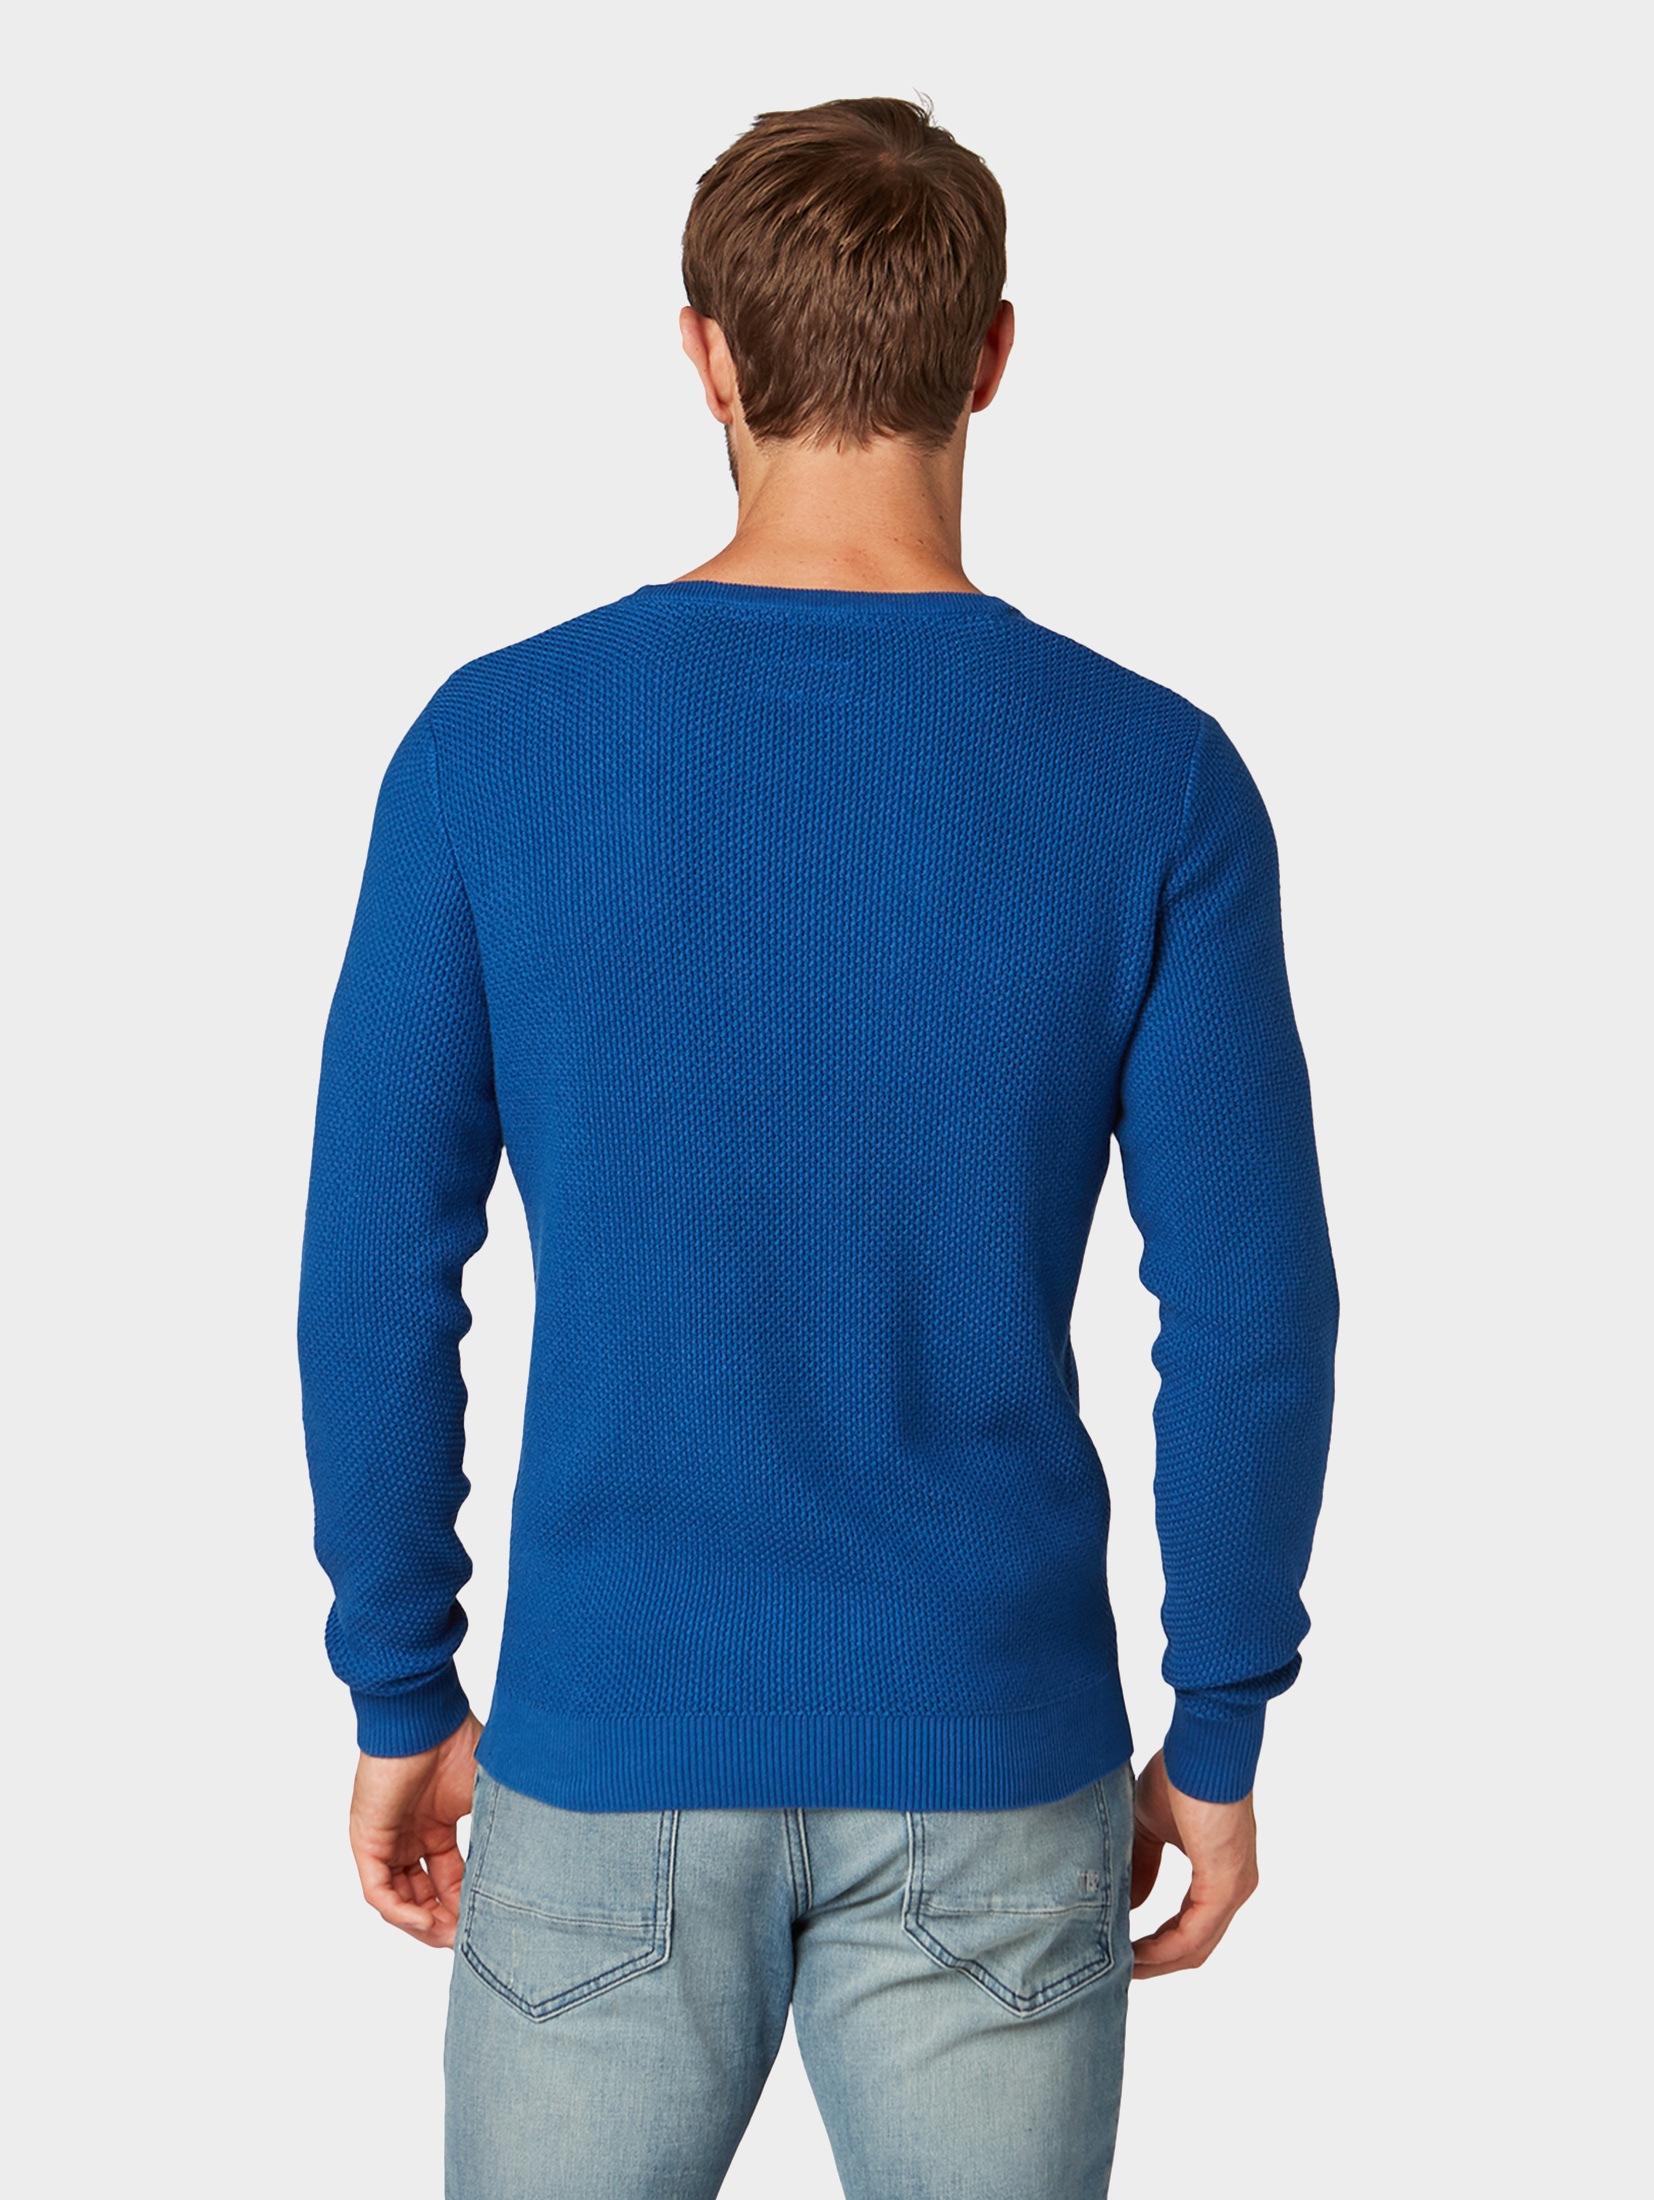 TOM TAILOR Rundhalspullover Strukturierter Strickpullover   Bekleidung > Pullover > Rundhalspullover   Tom Tailor